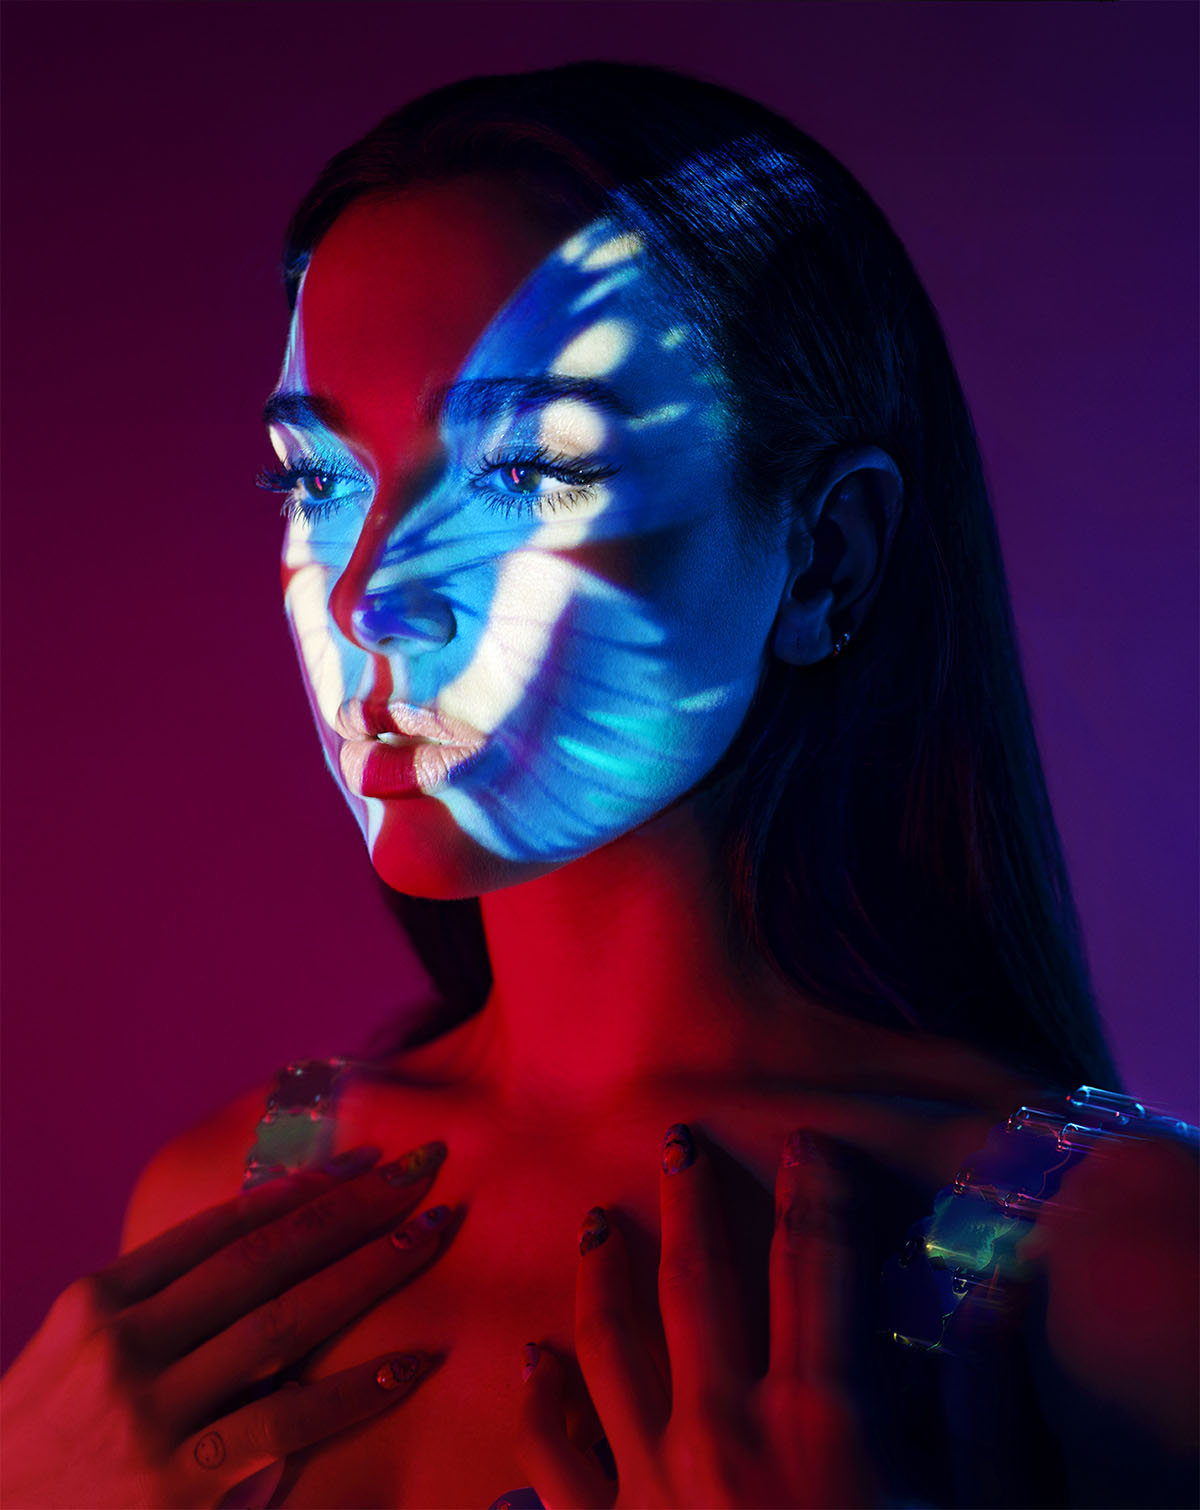 Dua Lipa covers Rolling Stone February 2021 by David LaChapelle